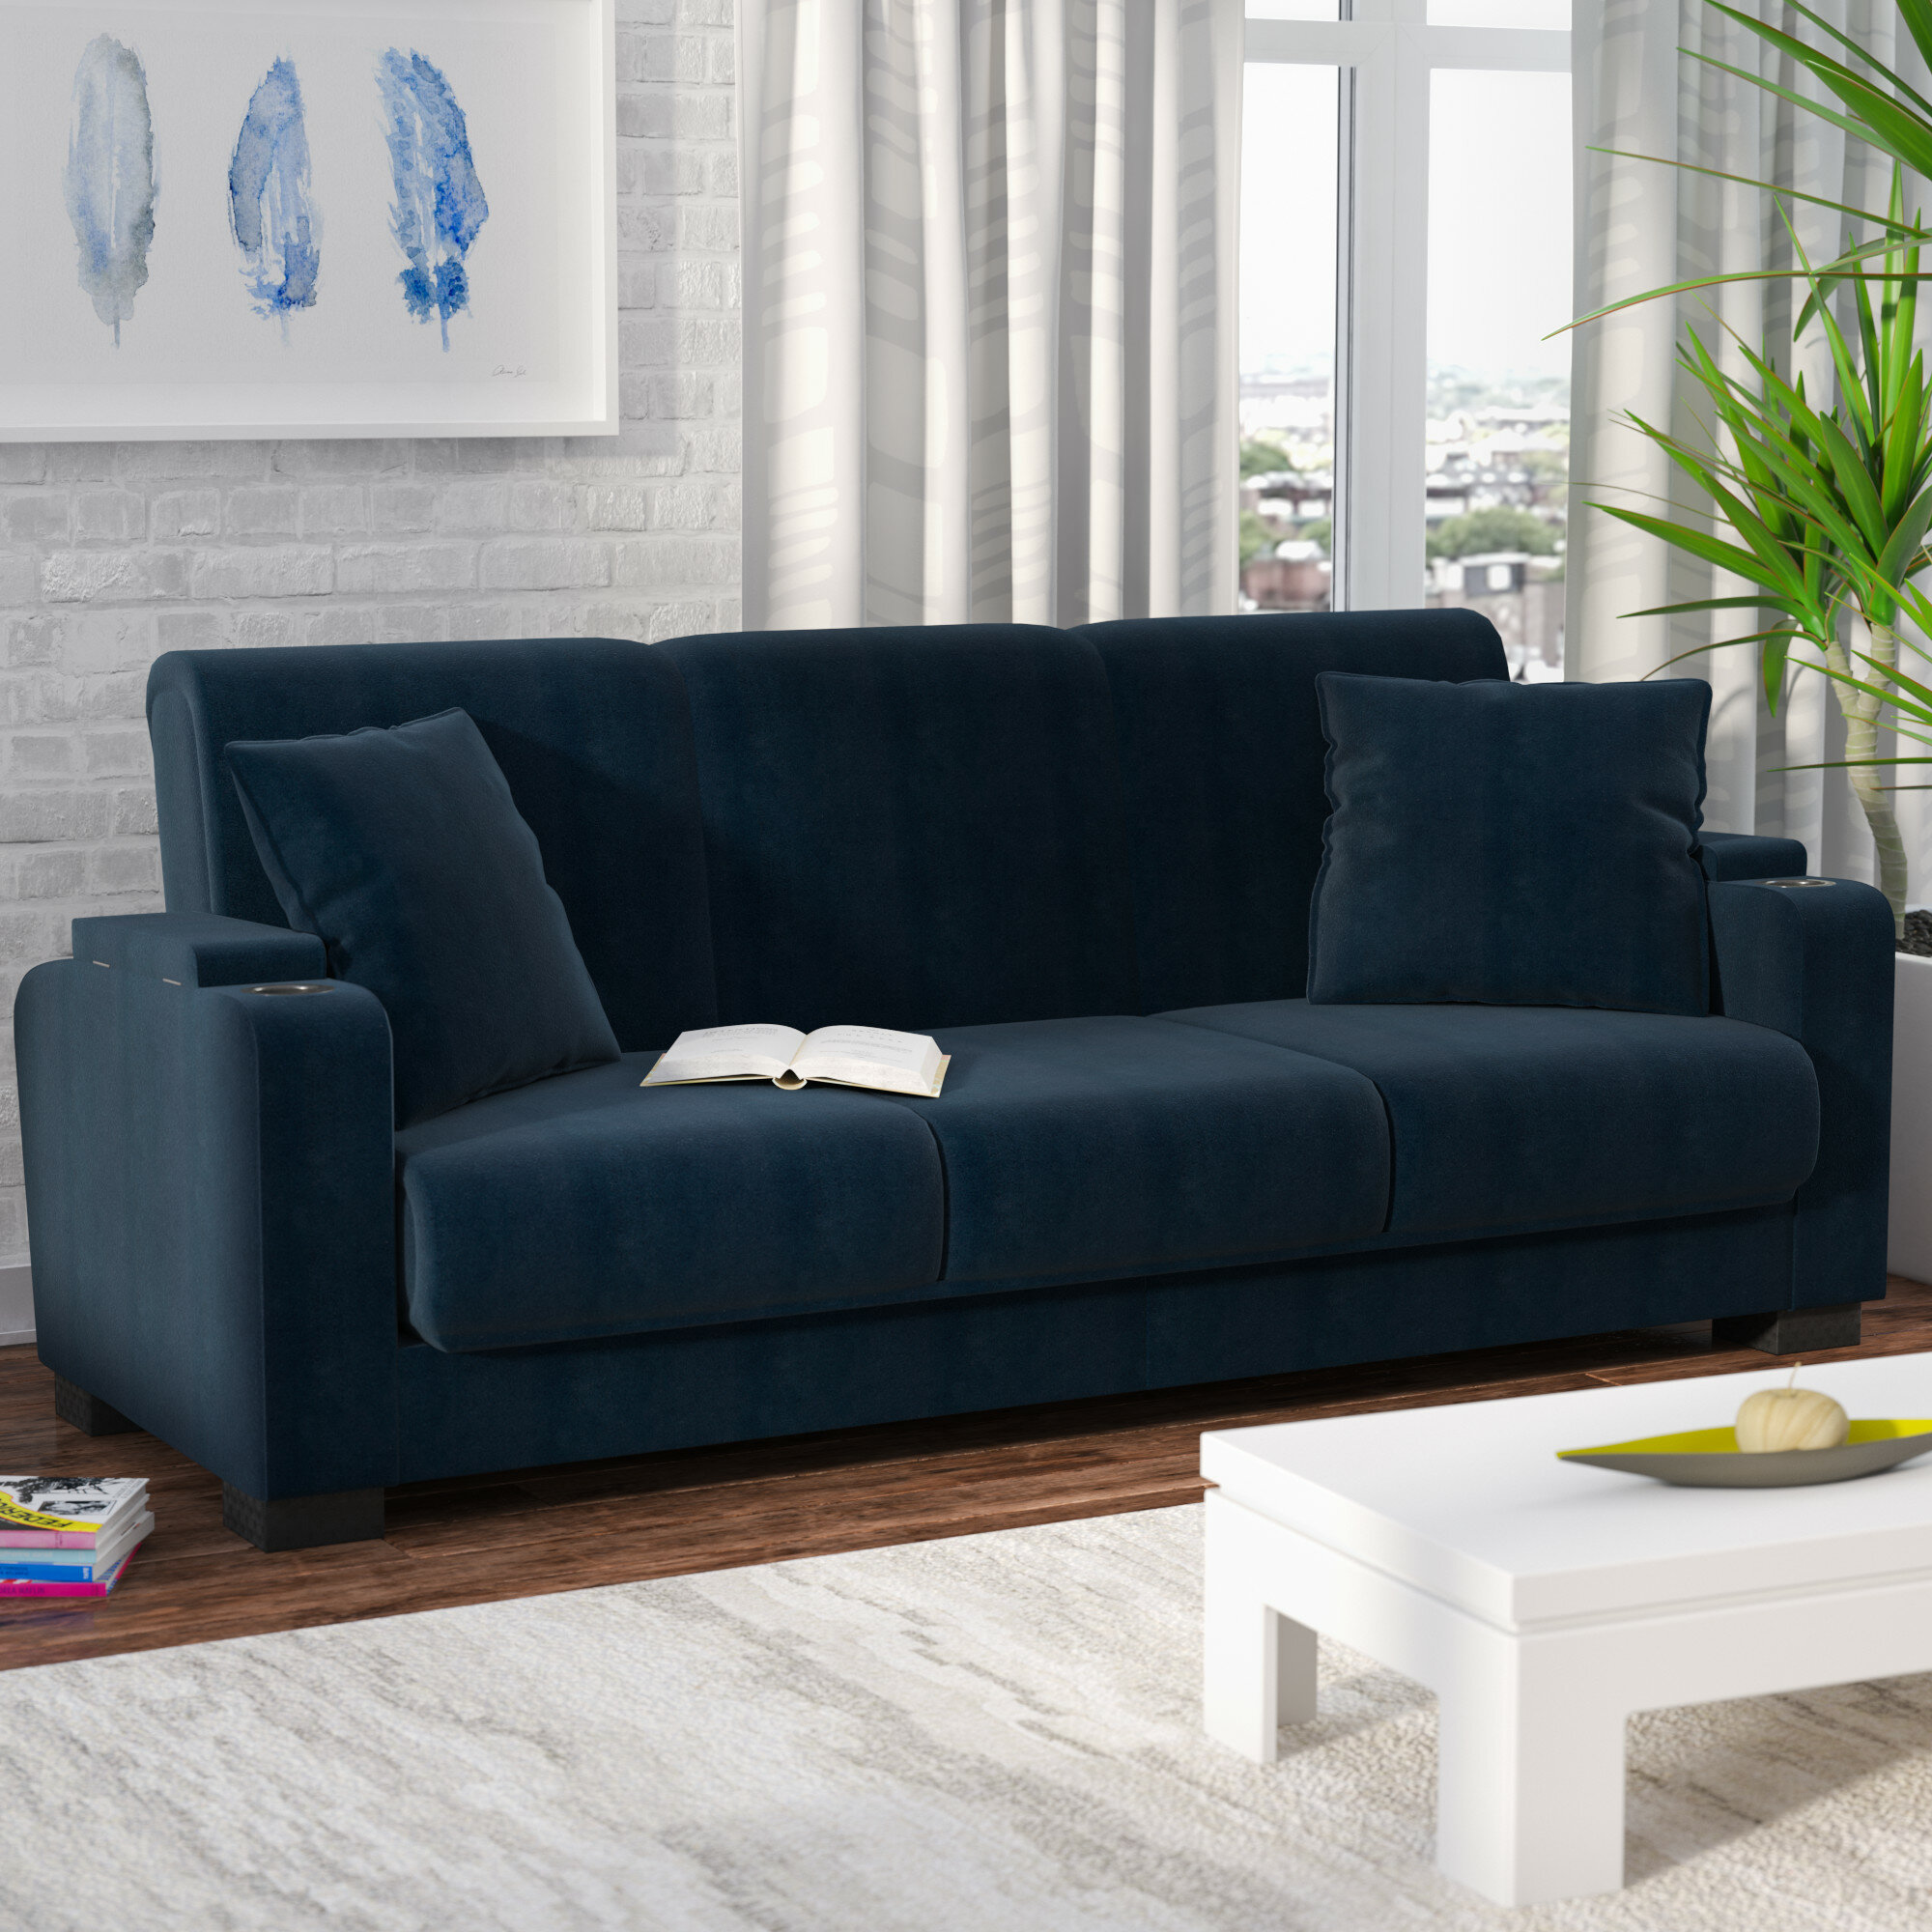 T Austin Design Ciera Convertible Sleeper Sofa Reviews Wayfair Ca